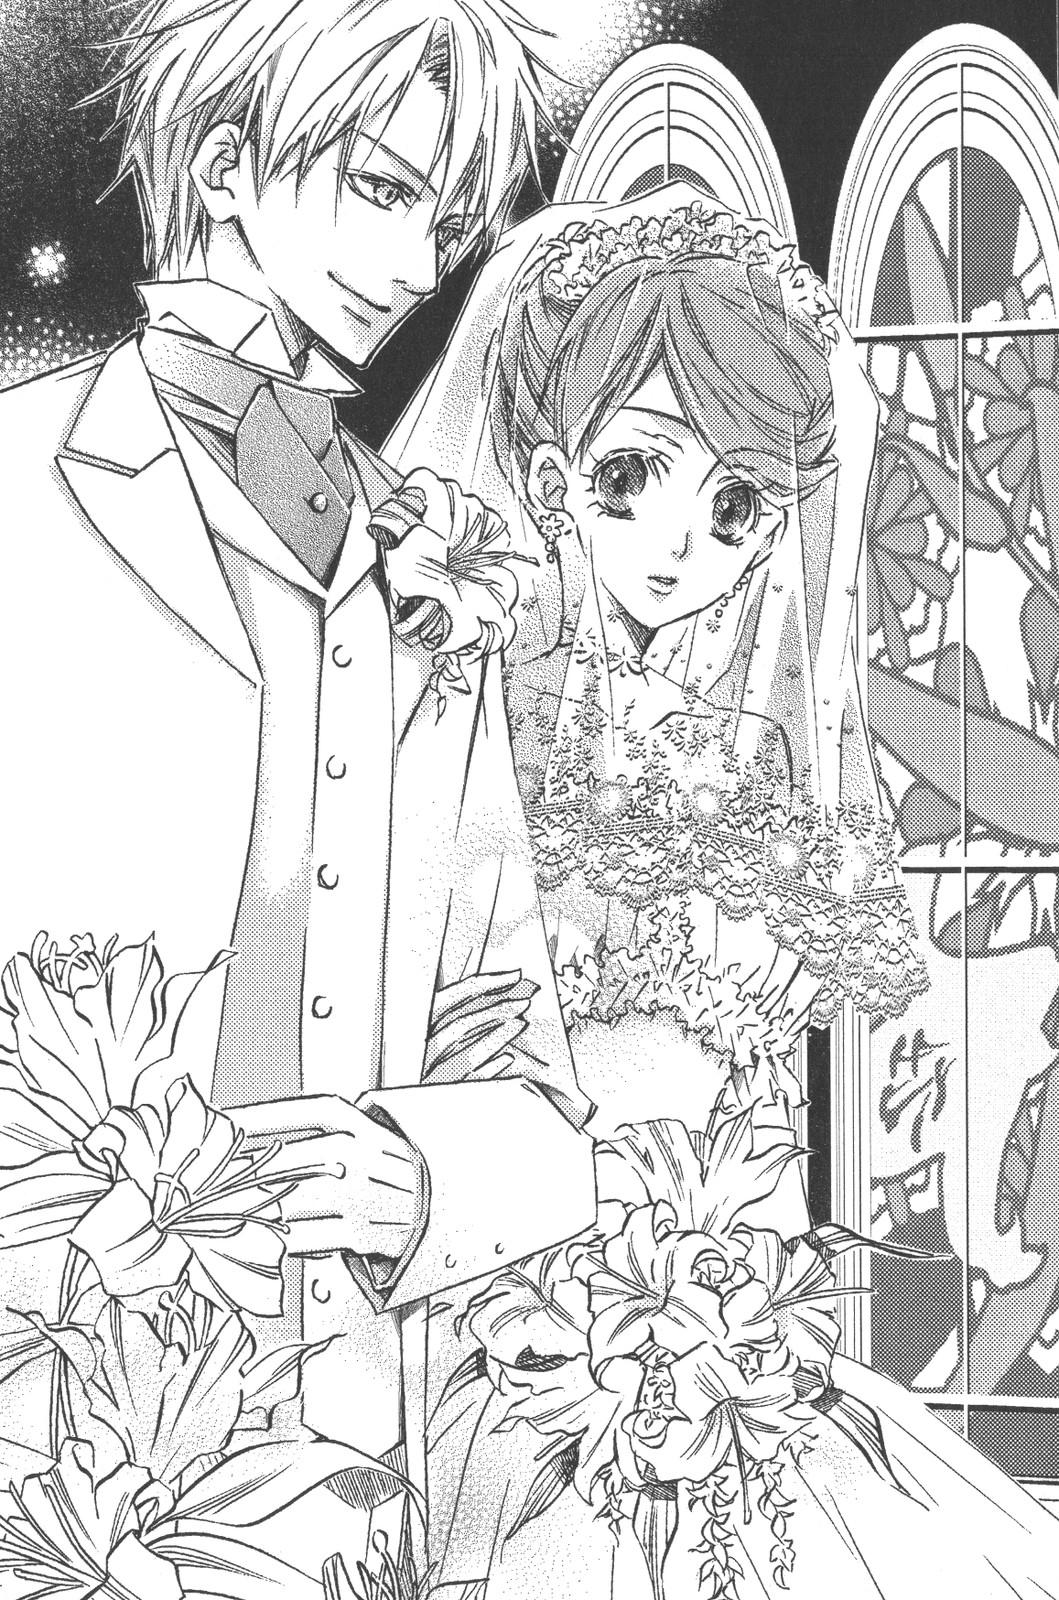 Tags: Anime, Takaboshi Asako, Hakushaku to Yousei, Lydia Carlton